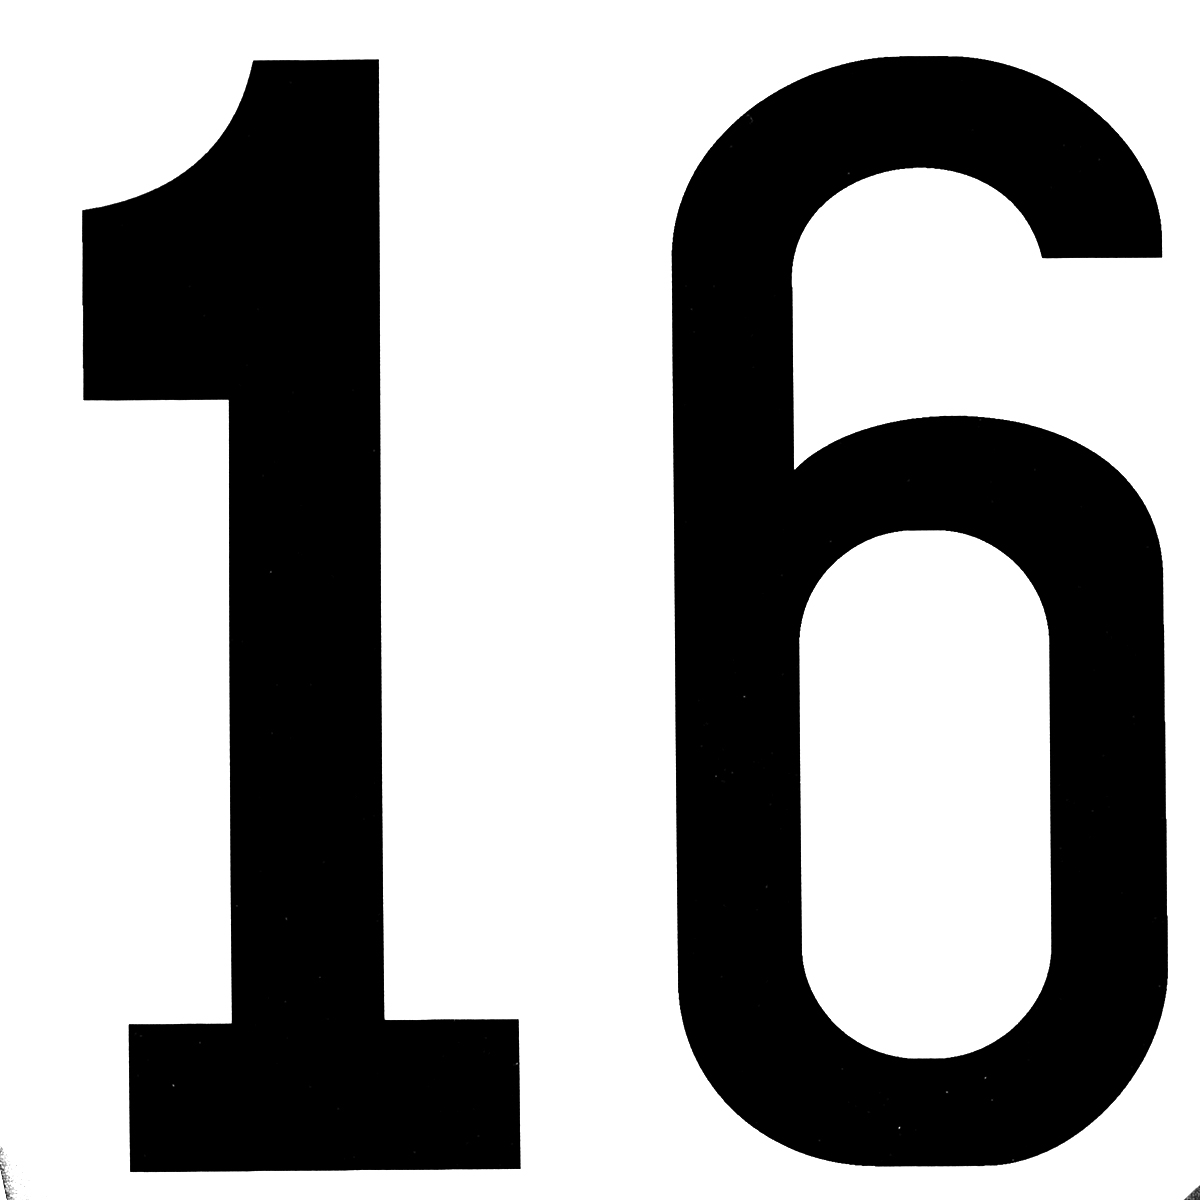 16 - Dr. Odd